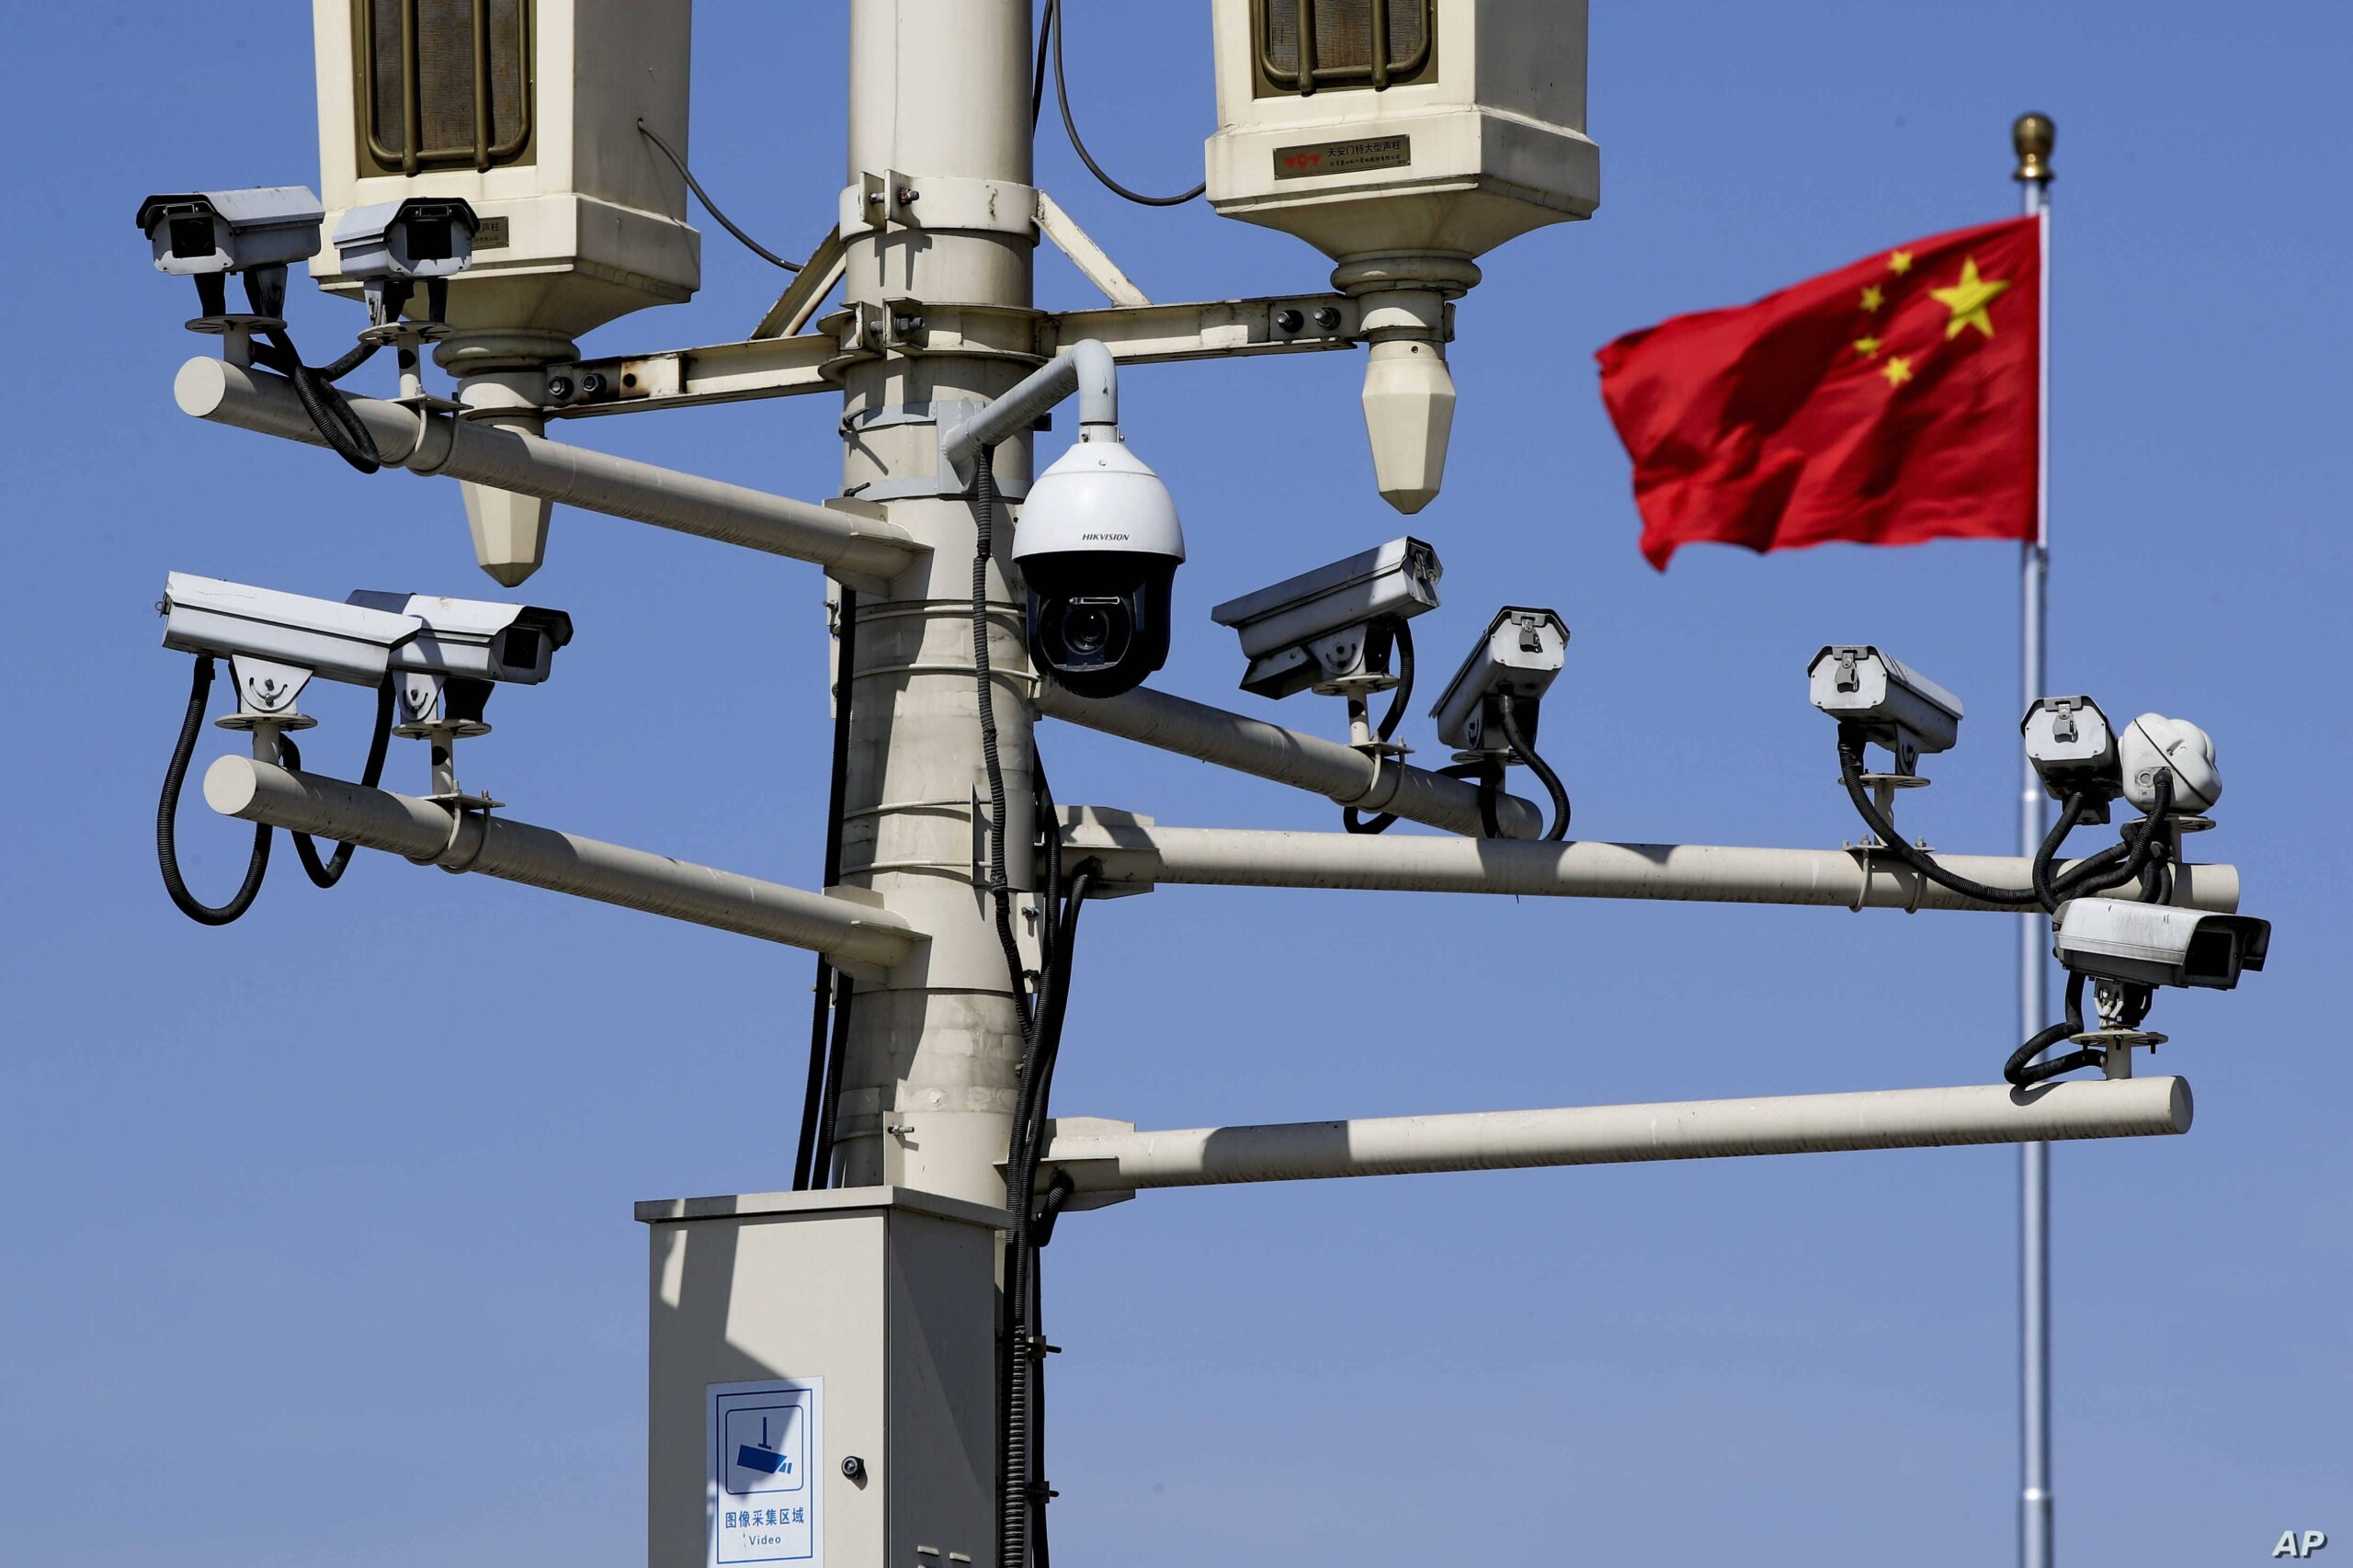 China Camera 1 scaled - توتالیتاریسم، اقتدارگرایی و فاشیسم، تفاوت در چیست؟ - موسولینی فاشیست, فاشیسم چیست, دیکتاتور, توتالیتریسم چیست, توتالیتر چیست, توتالیتاریسم, تفاوت فاشیسم و, ایدئولوژی, اقتدارگرایی چیست, اقتدارگرایی, آدولف هیتلر